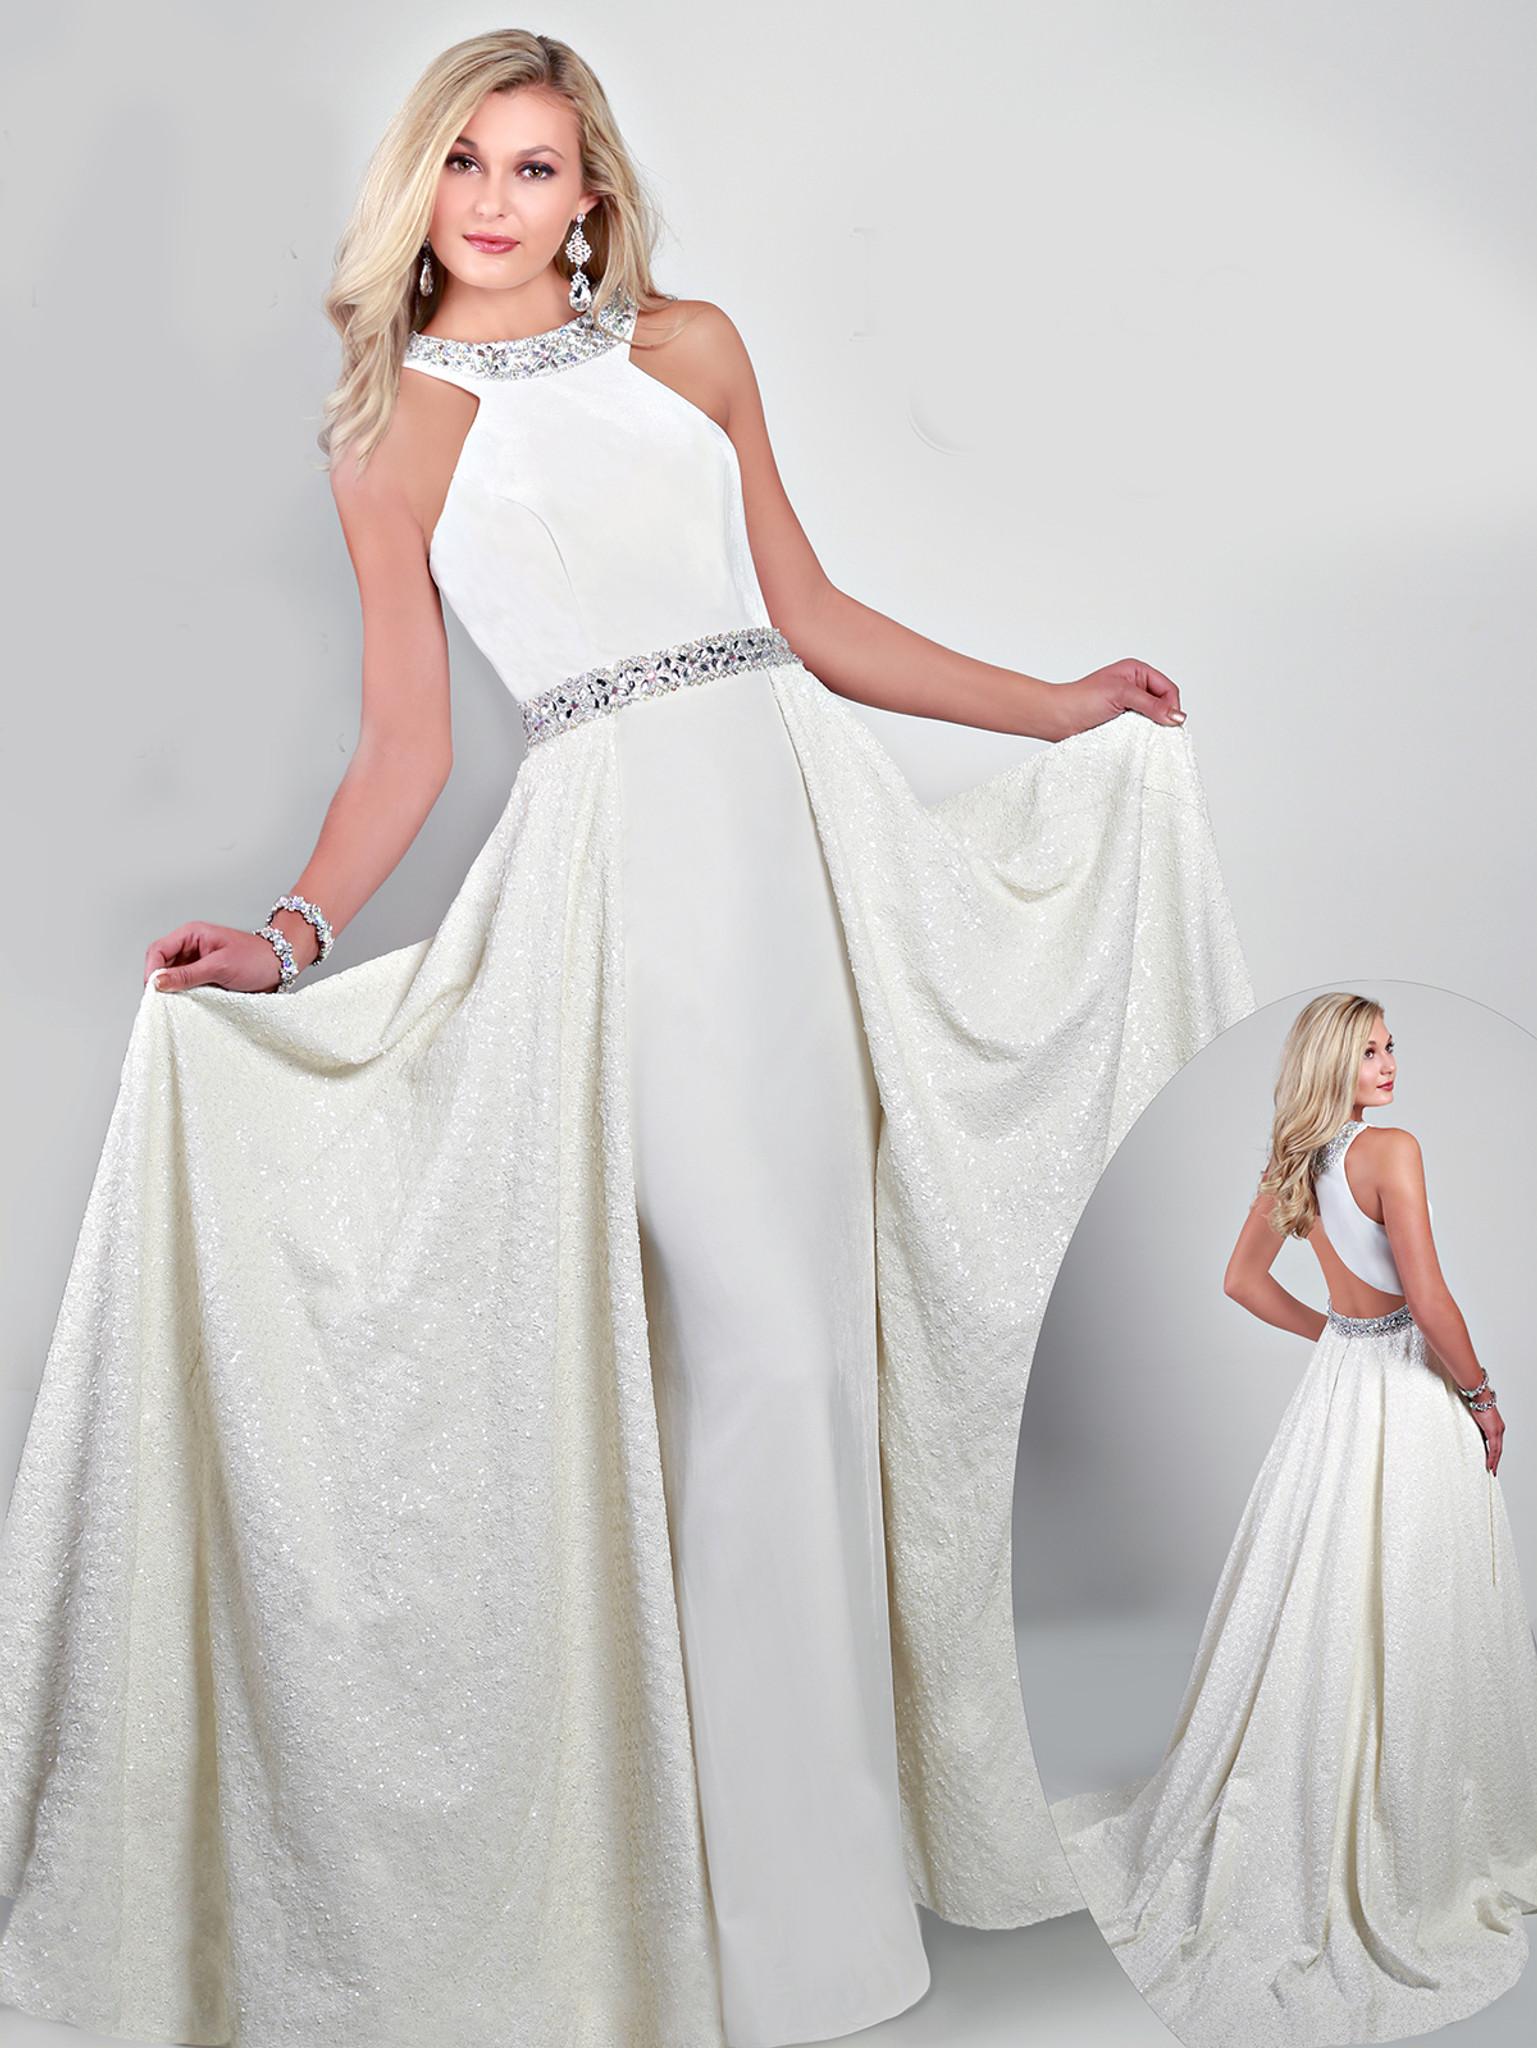 Diamond white velvet sequins ritzee originals dress 3243